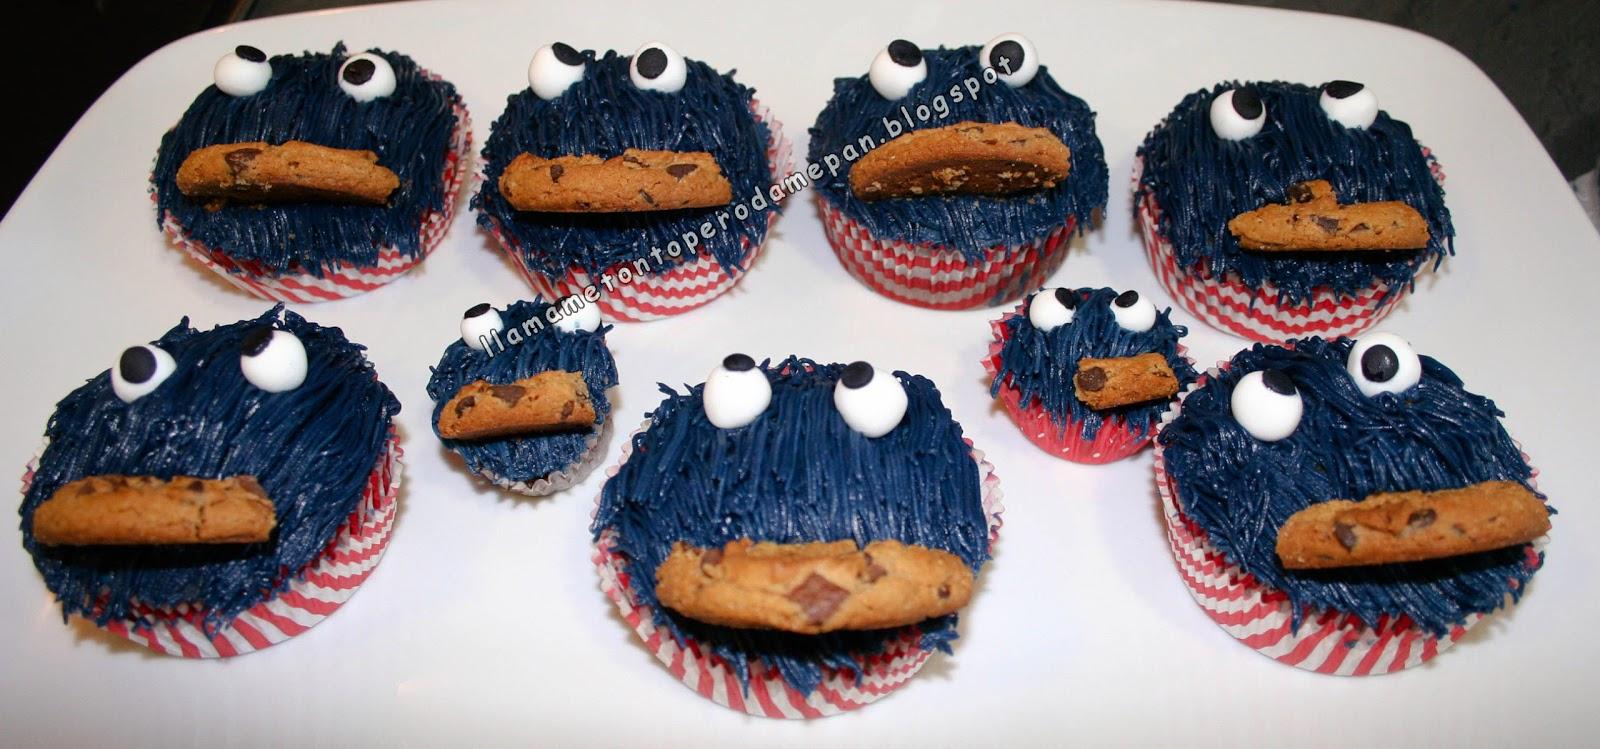 http://llamametontoperodamepan.blogspot.com.es/2013/06/recuerdos-de-la-infancia-en-un-cup-cake.html